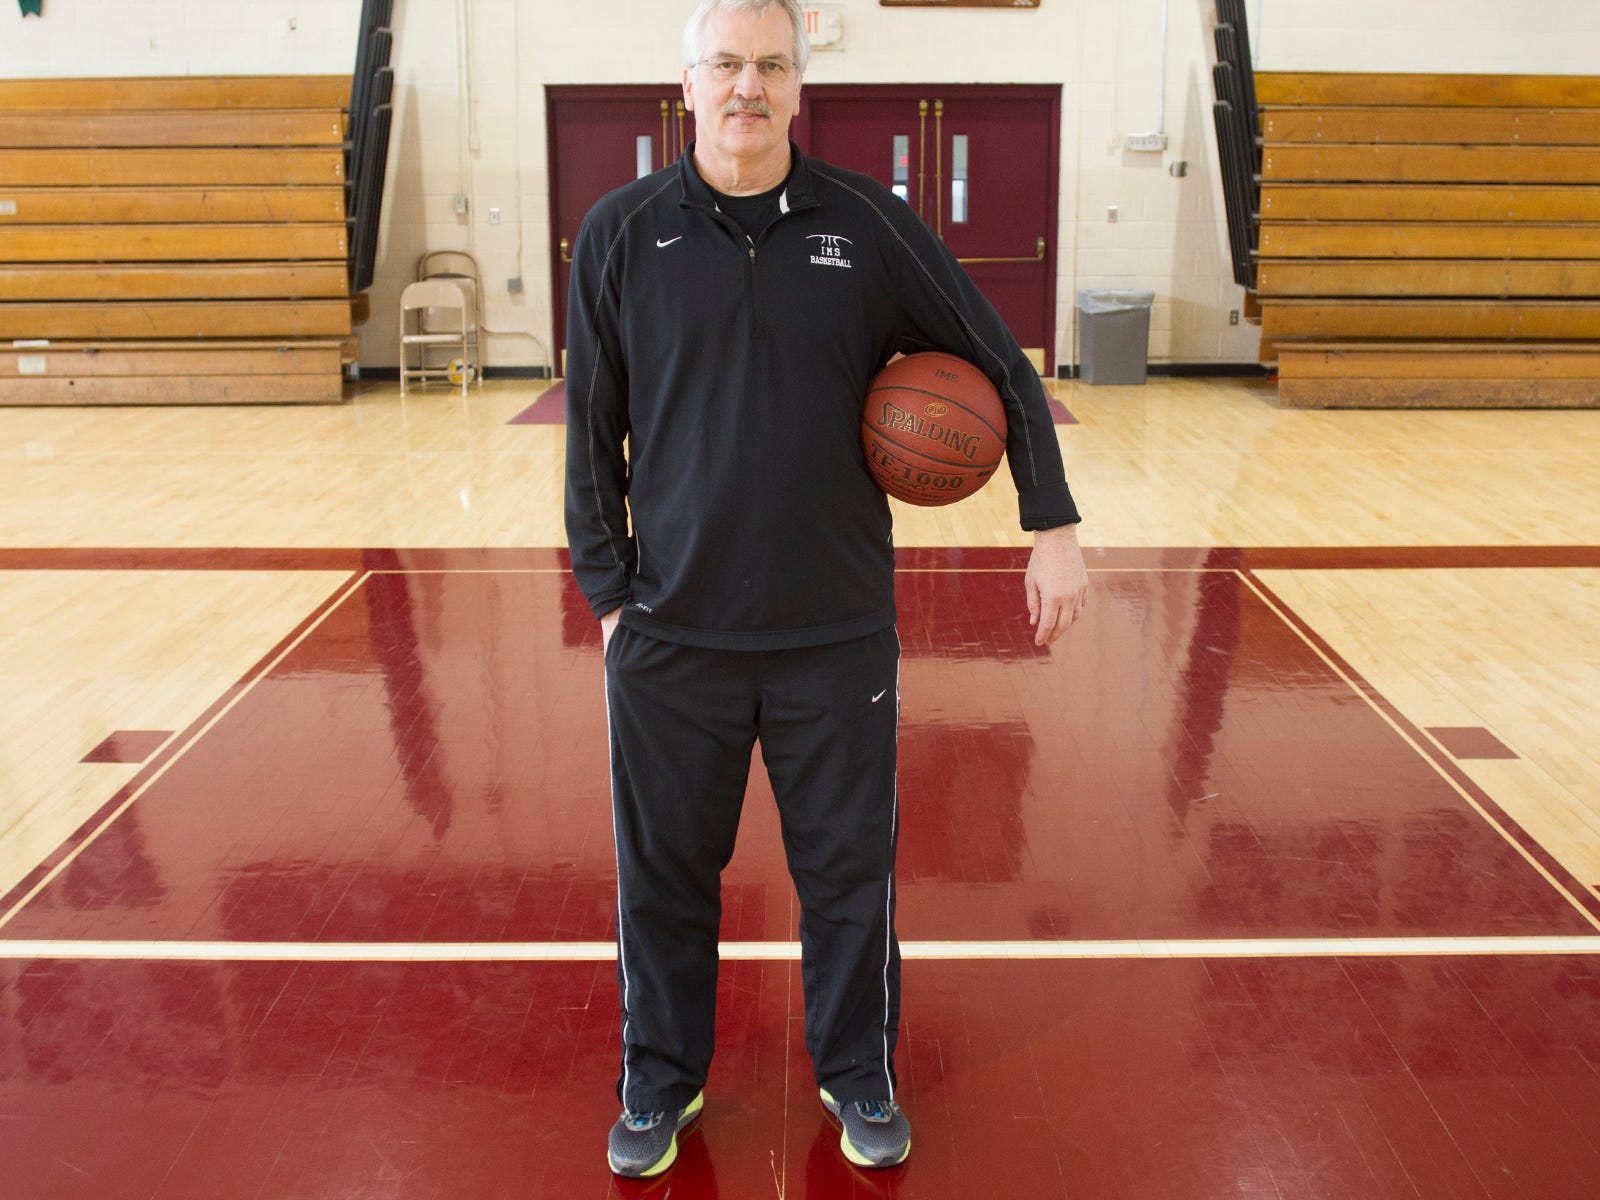 Iowa Mennonite School head coach Dwight Gingerich poses in his school's gym on Wednesday, Feb. 11, 2015.